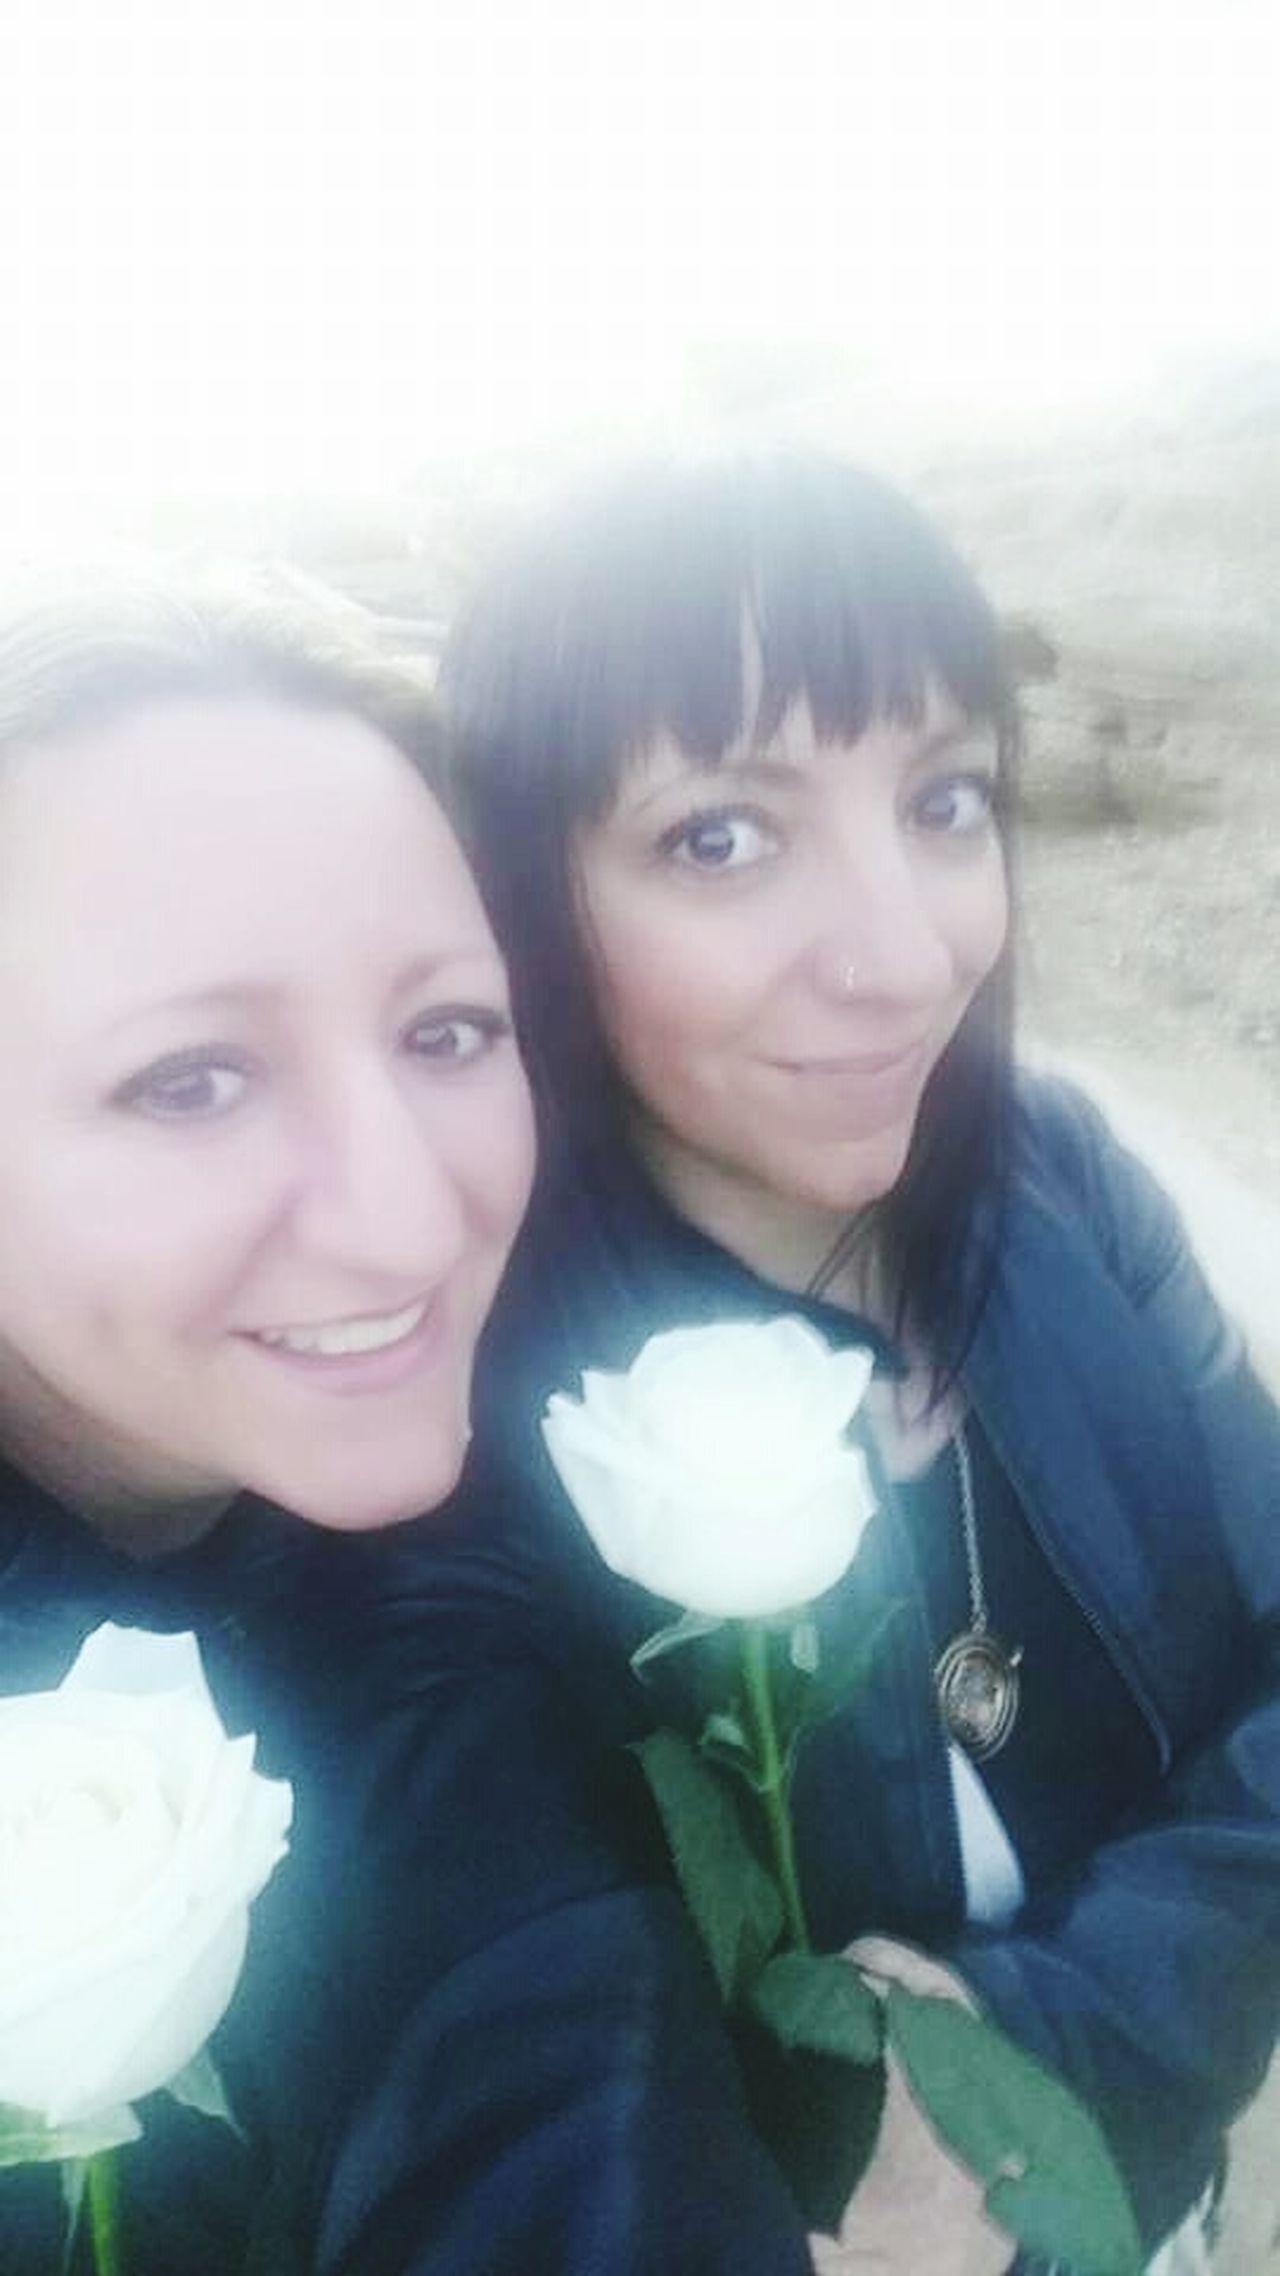 Girls Flowers Chicas Flores Sonrisa Smile Natural Light Portrait 43 Golden Moments